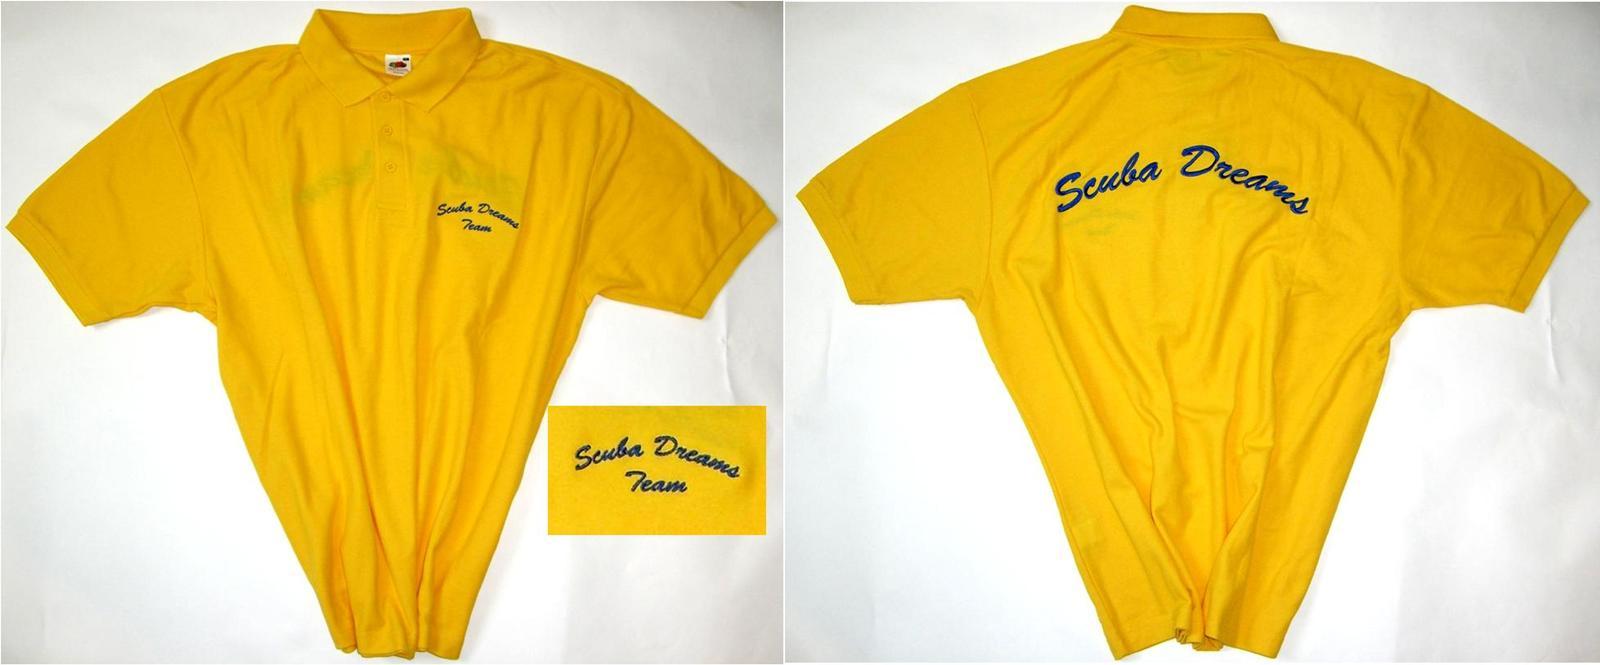 Scuba Dreams Team Poloshirt